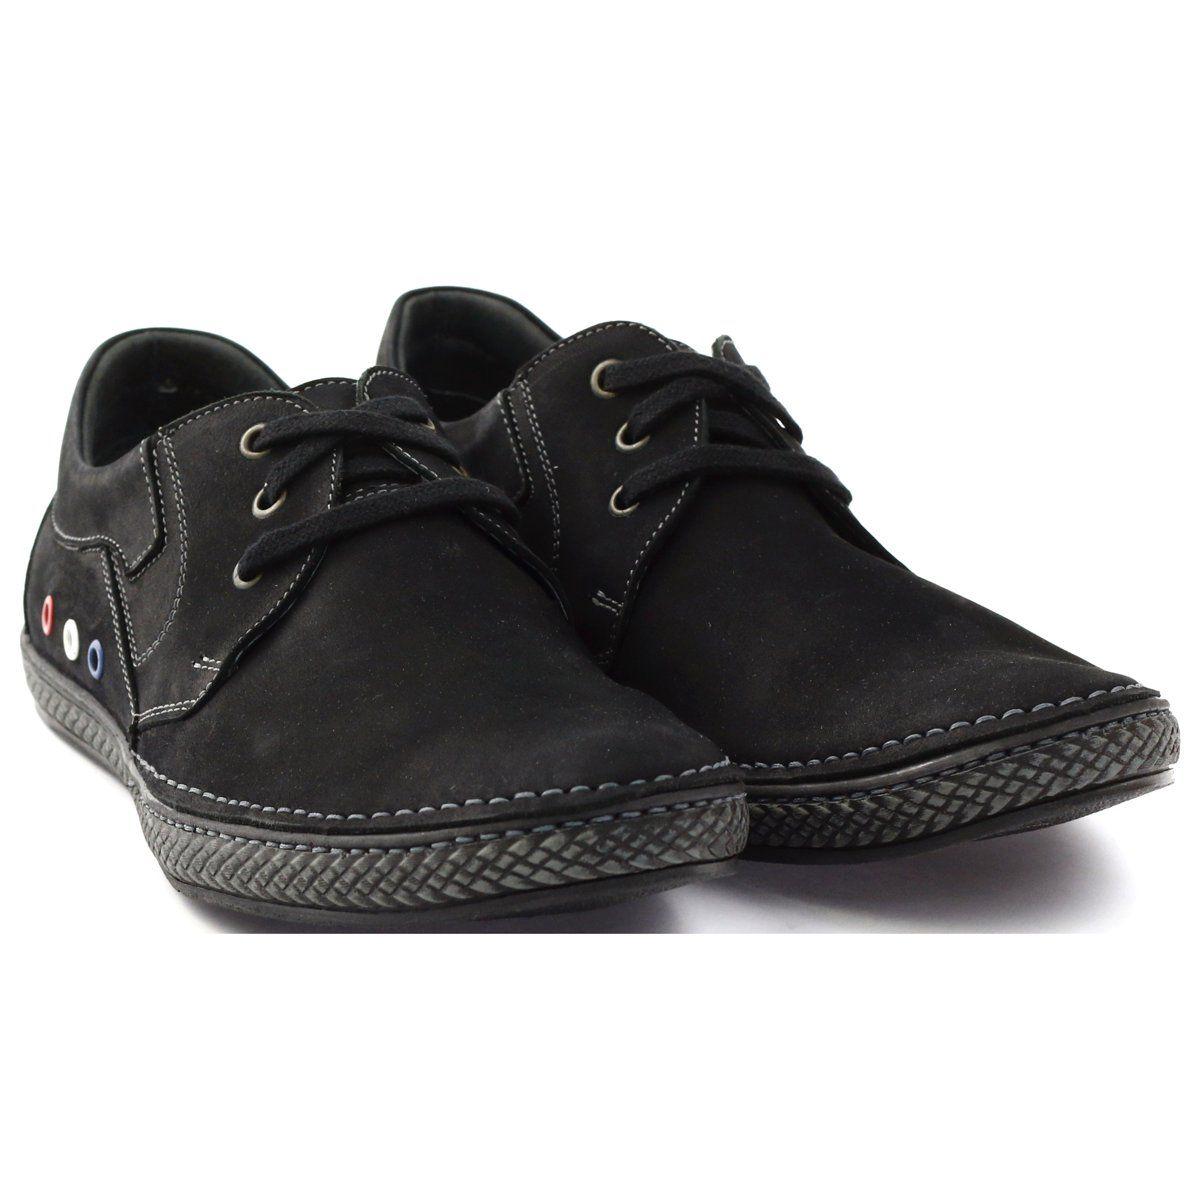 Polbuty Meskie Sportowe Daniel 1210 Czarne Sport Shoes Men Shoes Mens Shoes